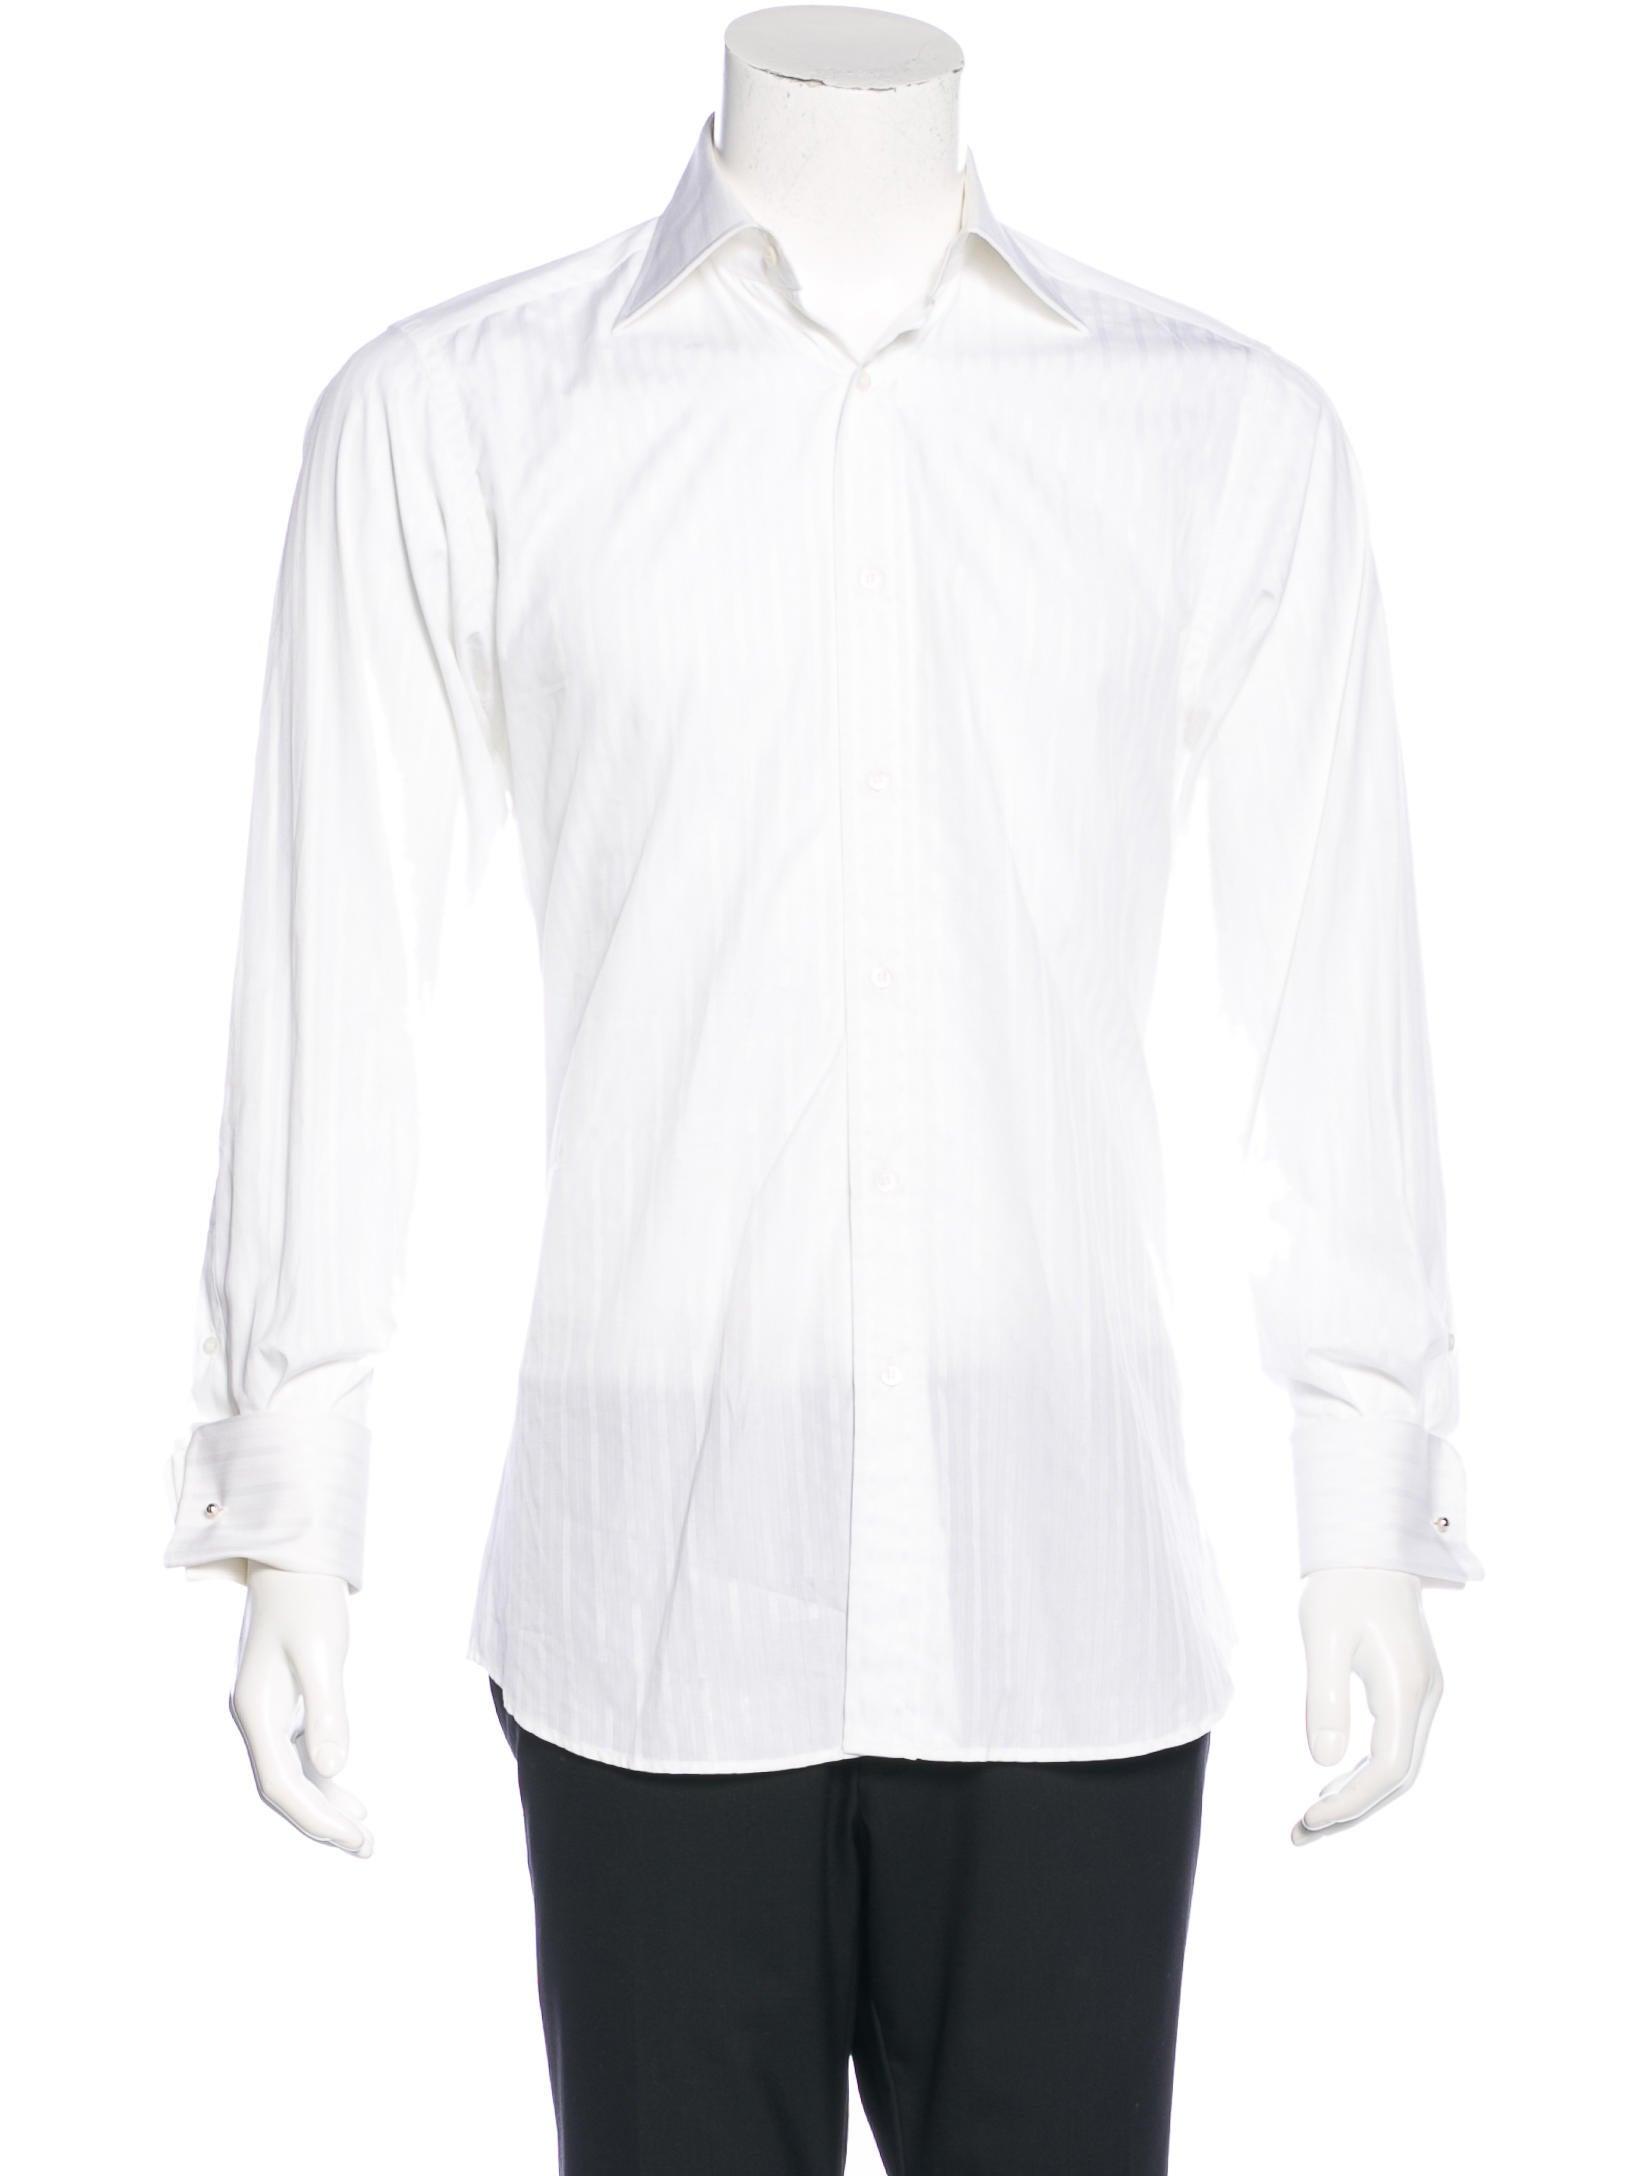 Gucci Striped French Cuff Shirt Clothing Guc135741